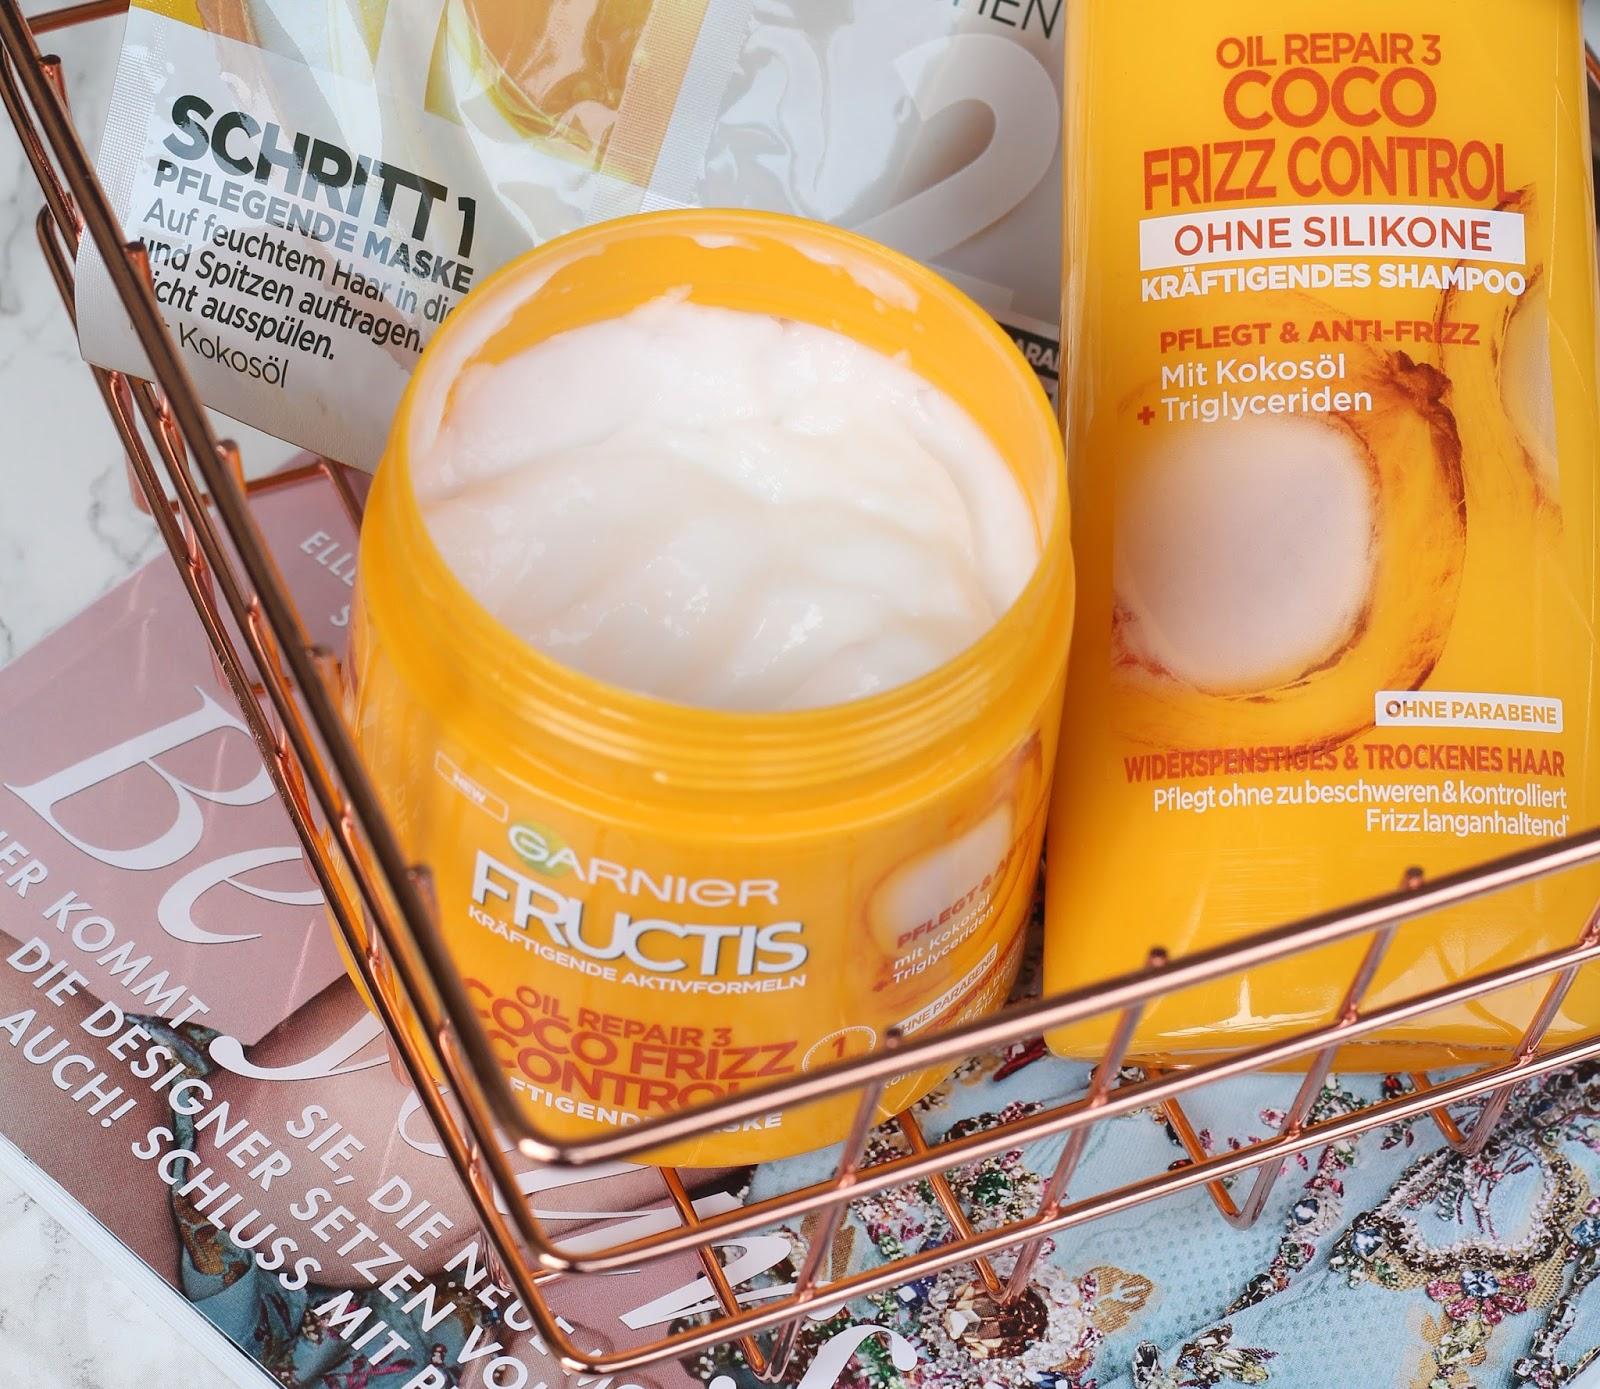 garnier fructis oil repair 3 coco frizz control review